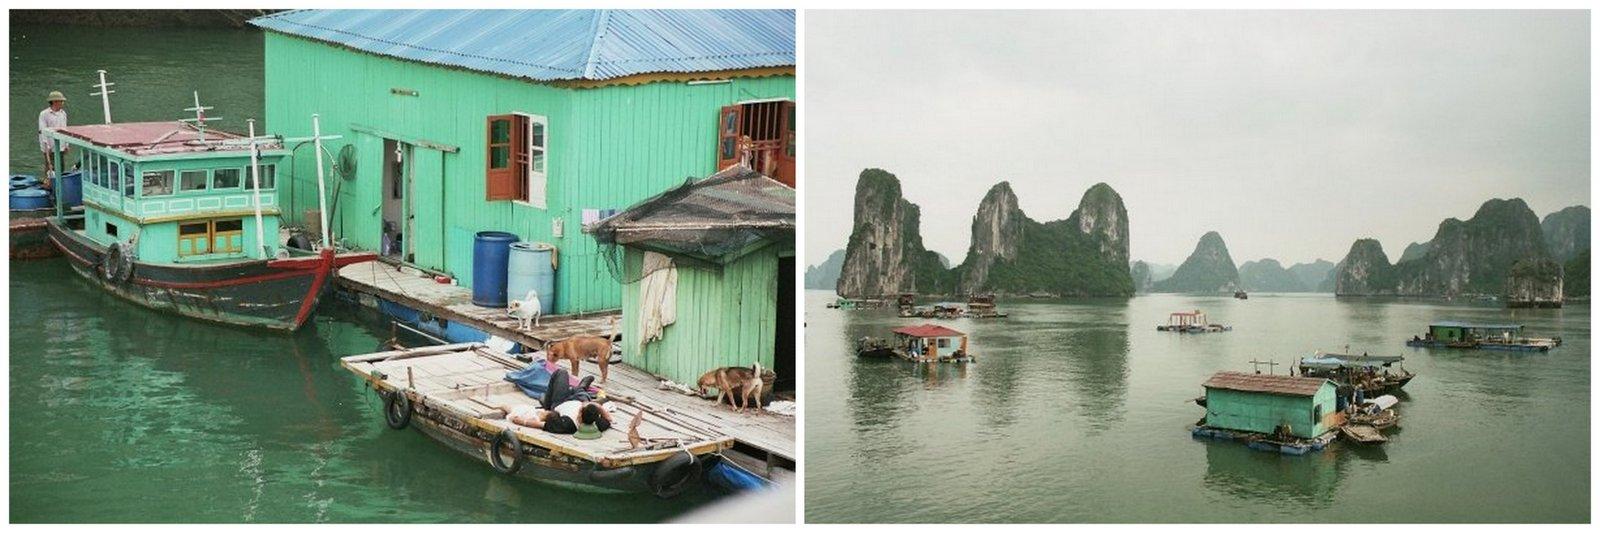 viajes-vietnam-bay-along-houses